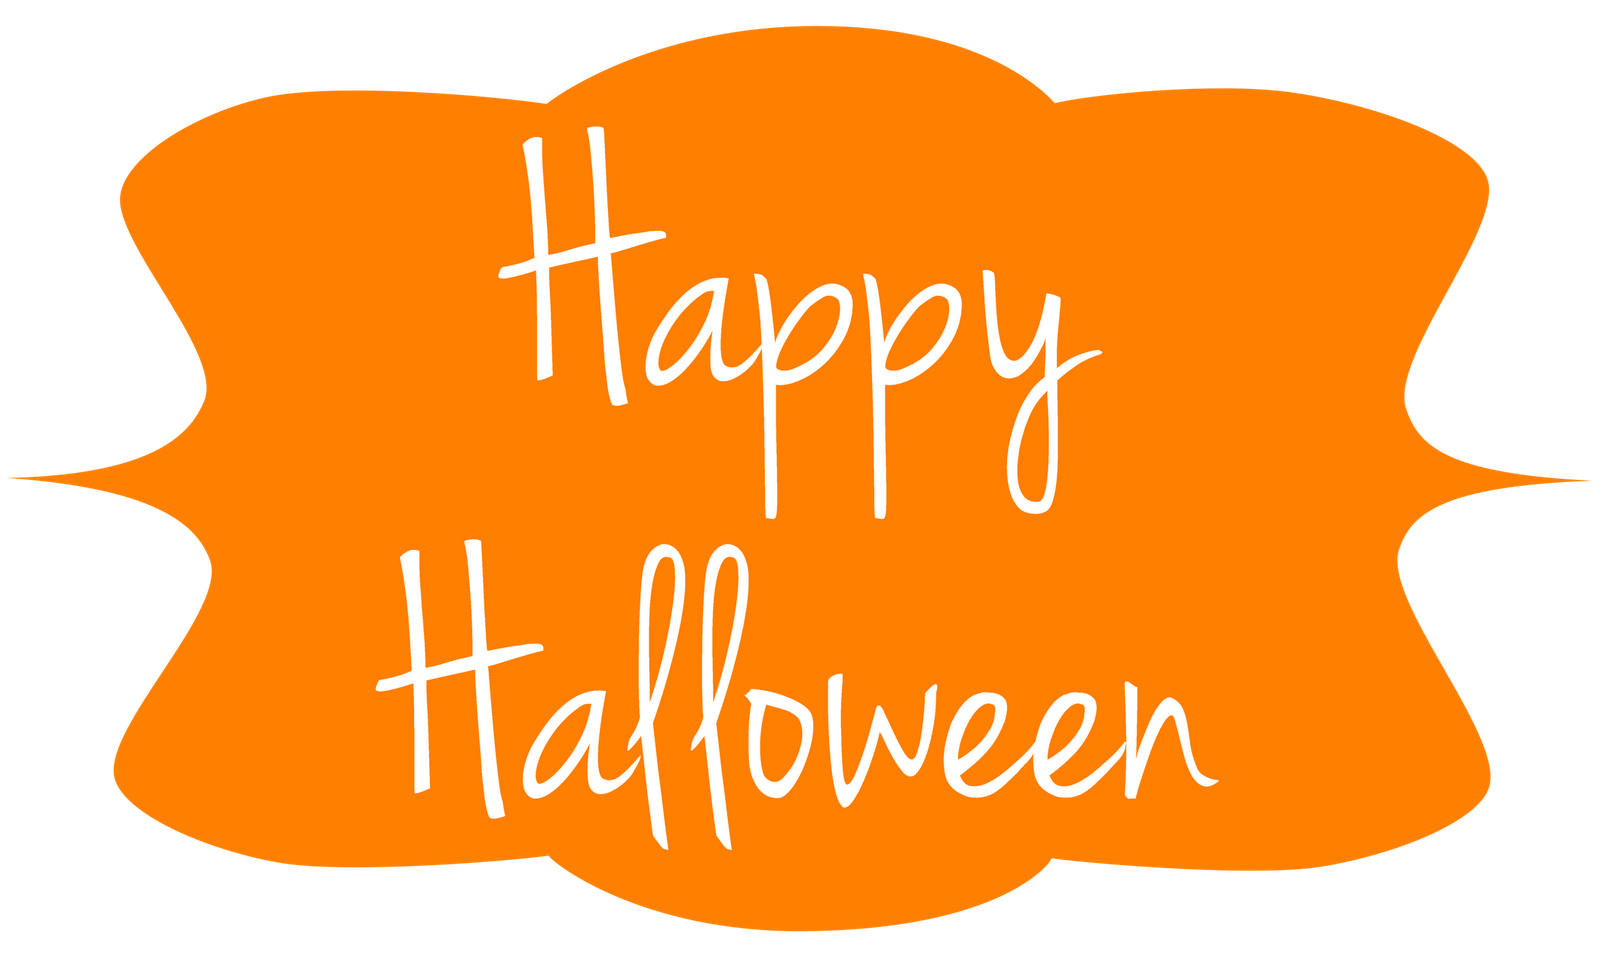 Halloween Clipart Hd Banner Halloween Images Free Halloween Clipart Happy Halloween Pictures